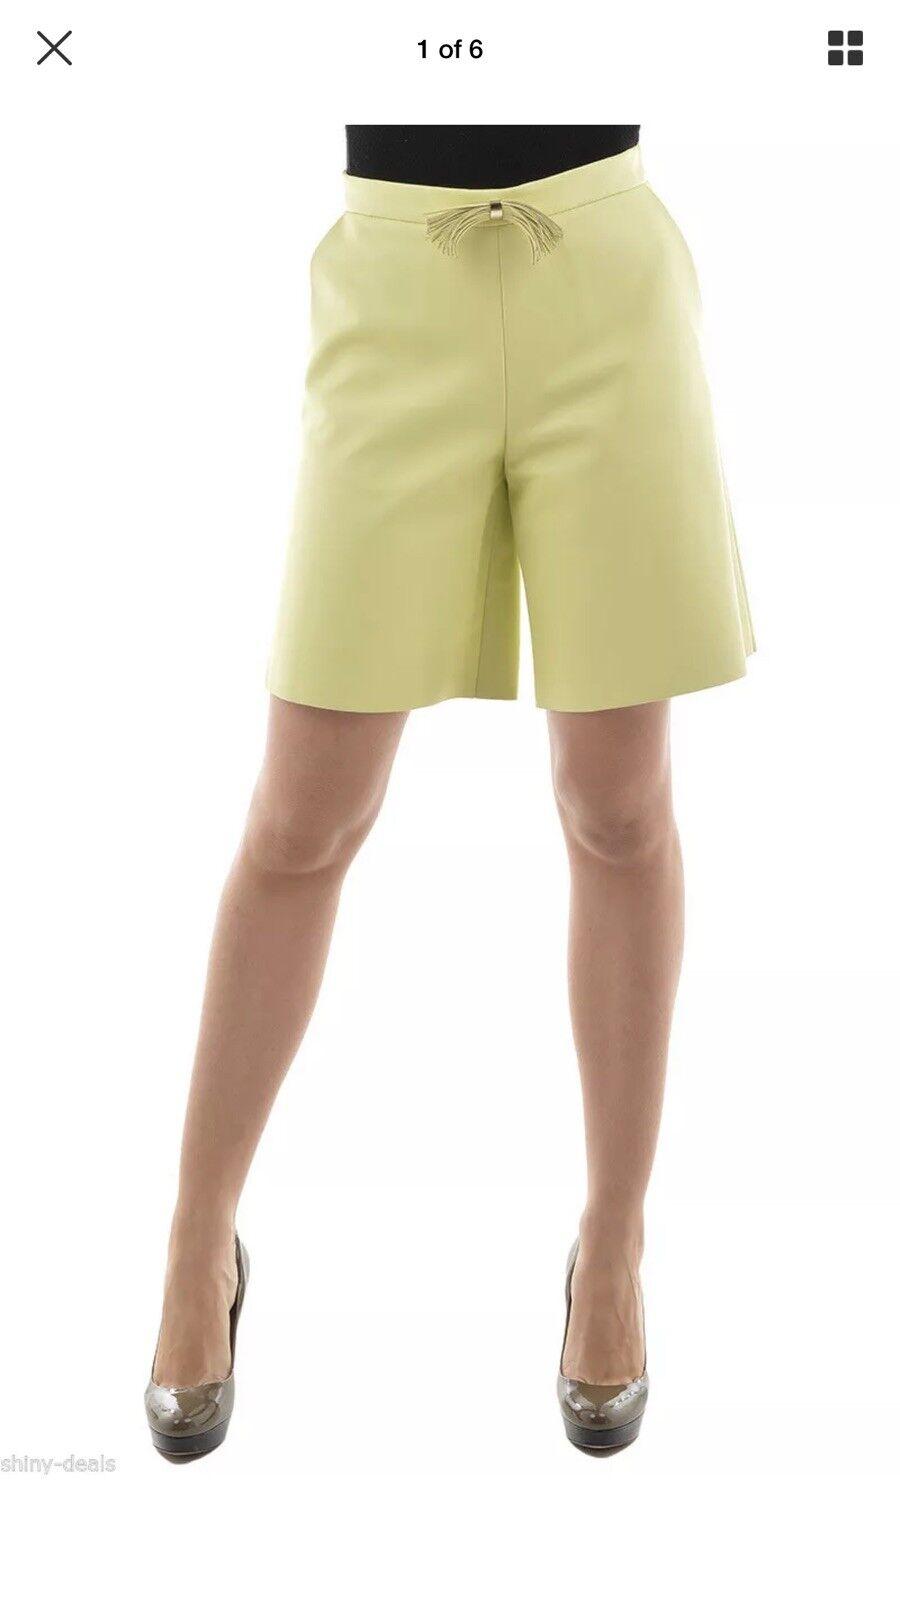 DROMe Yellow Lemon Lamb Leather Bermuda Shorts Pants Trouser size S, Fully Lined